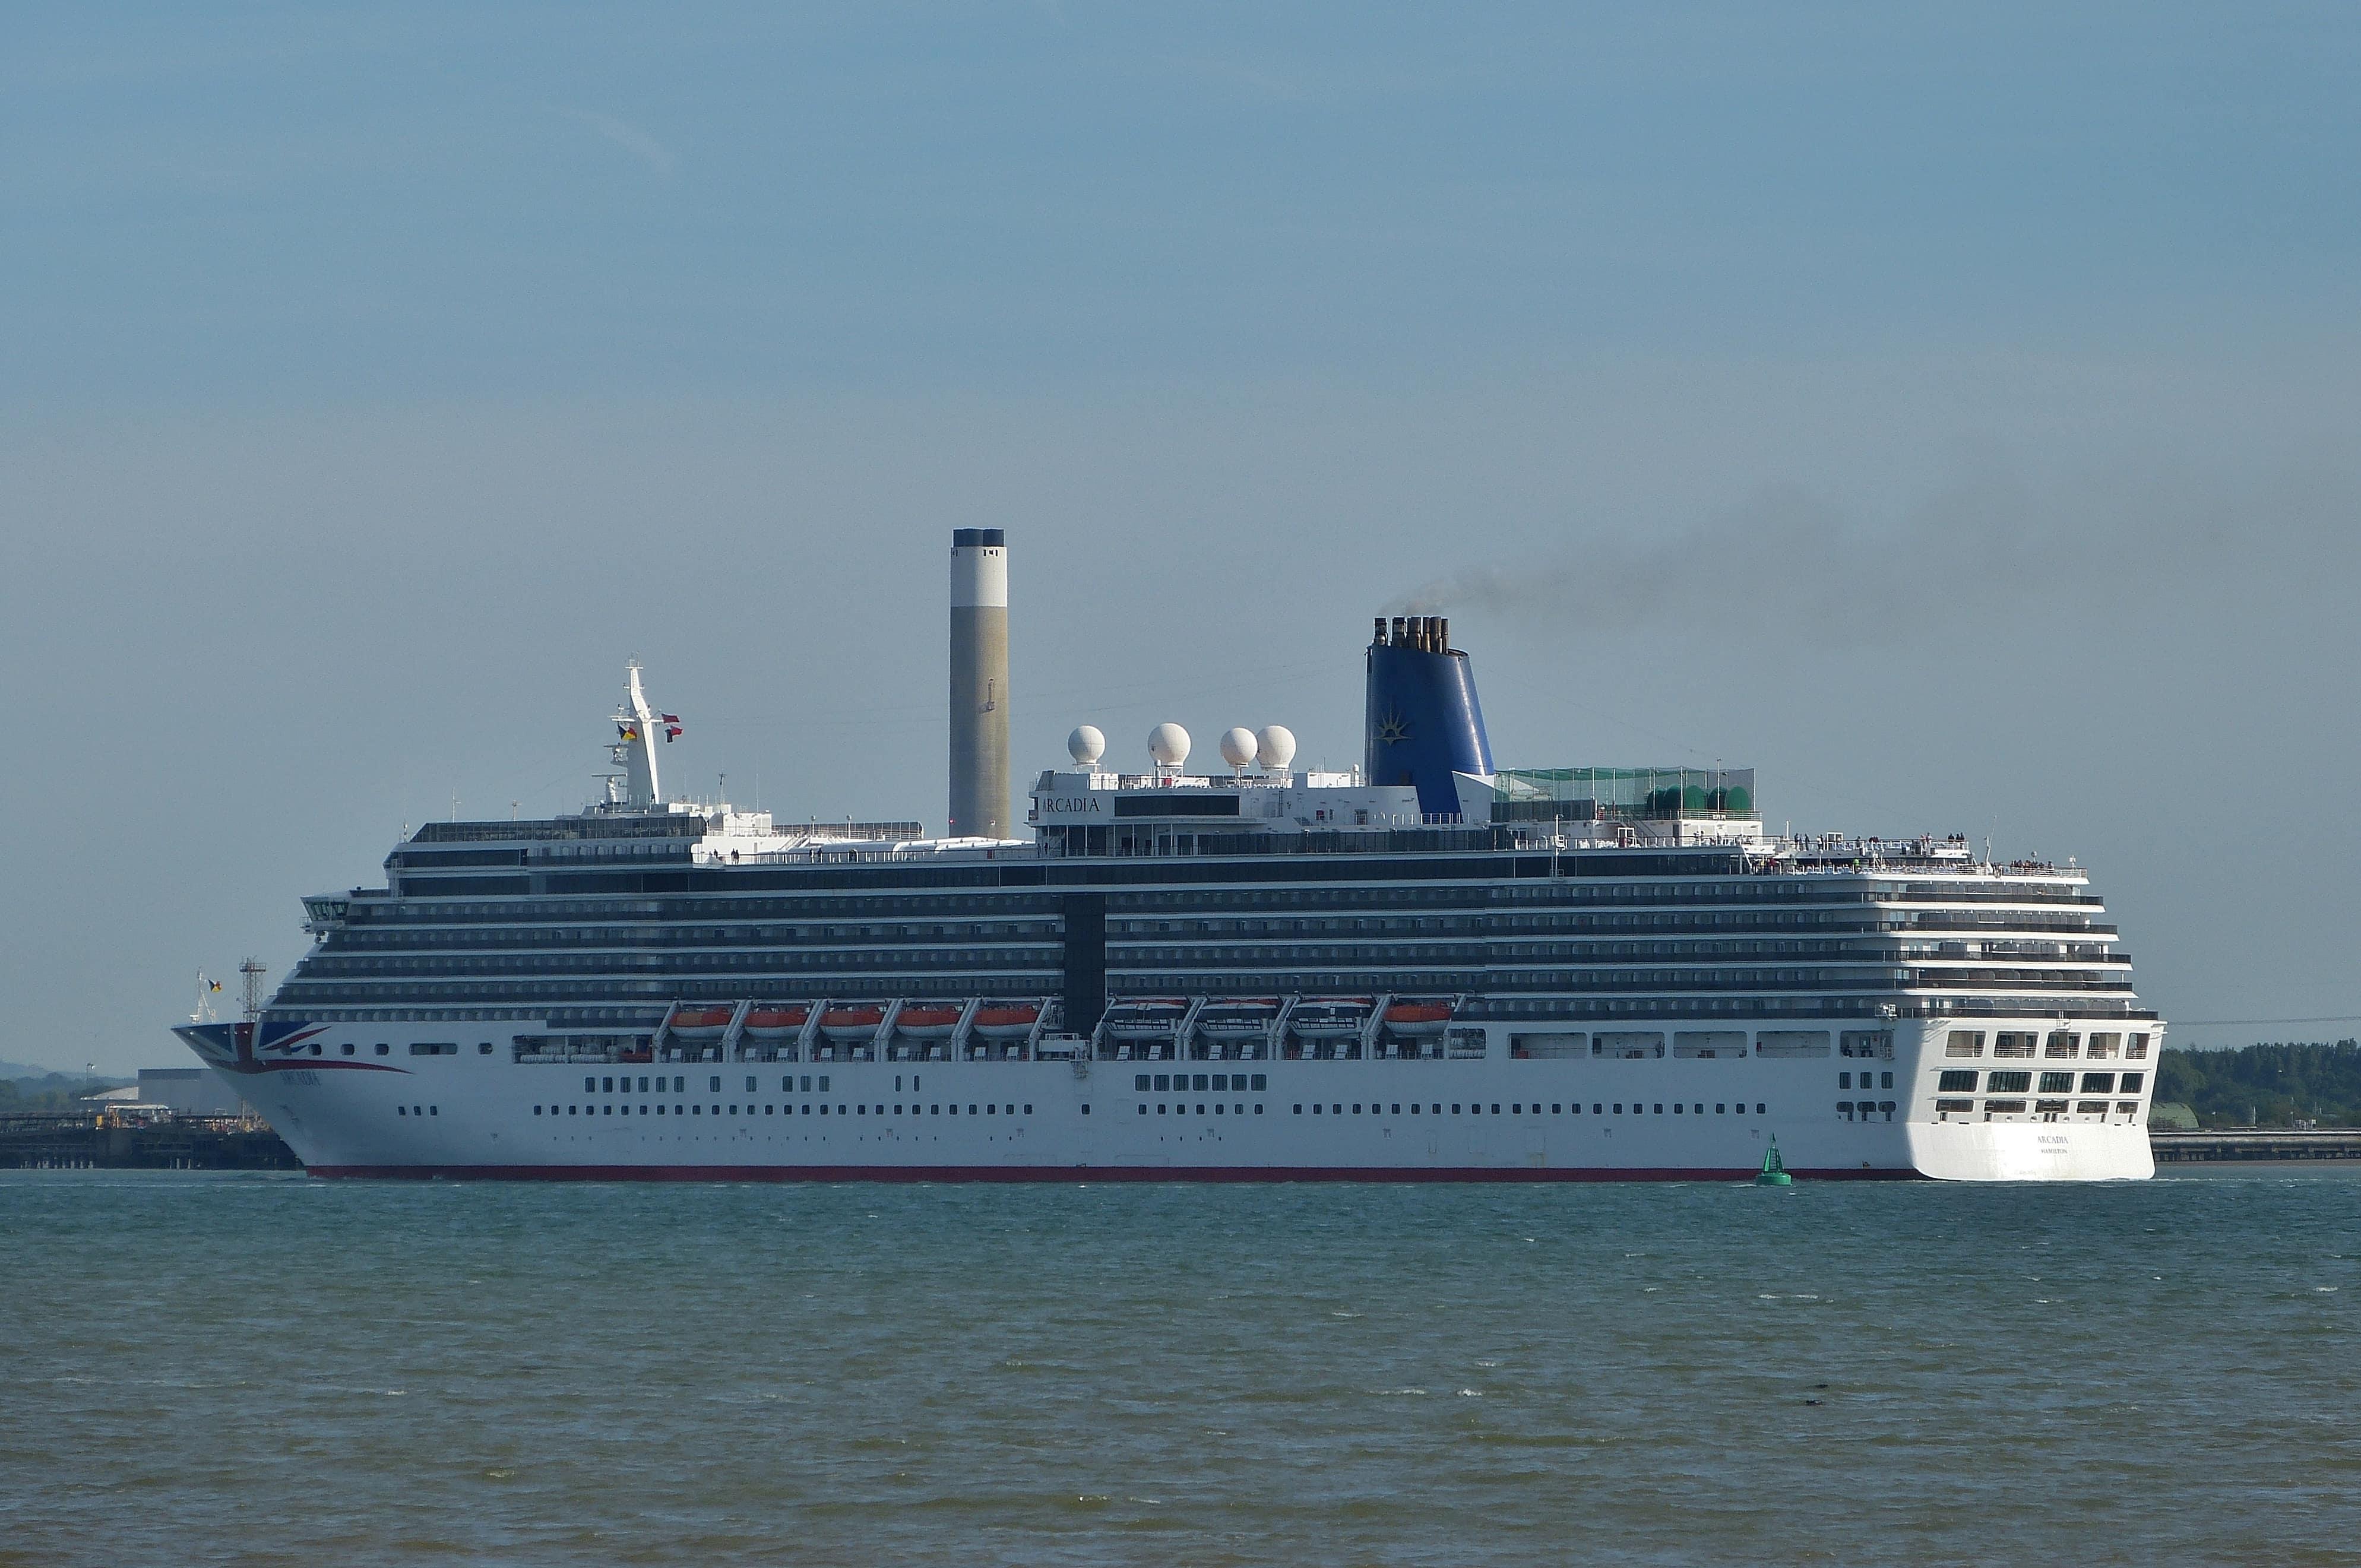 Royal Victoria Park southampton cruise ship arcadia